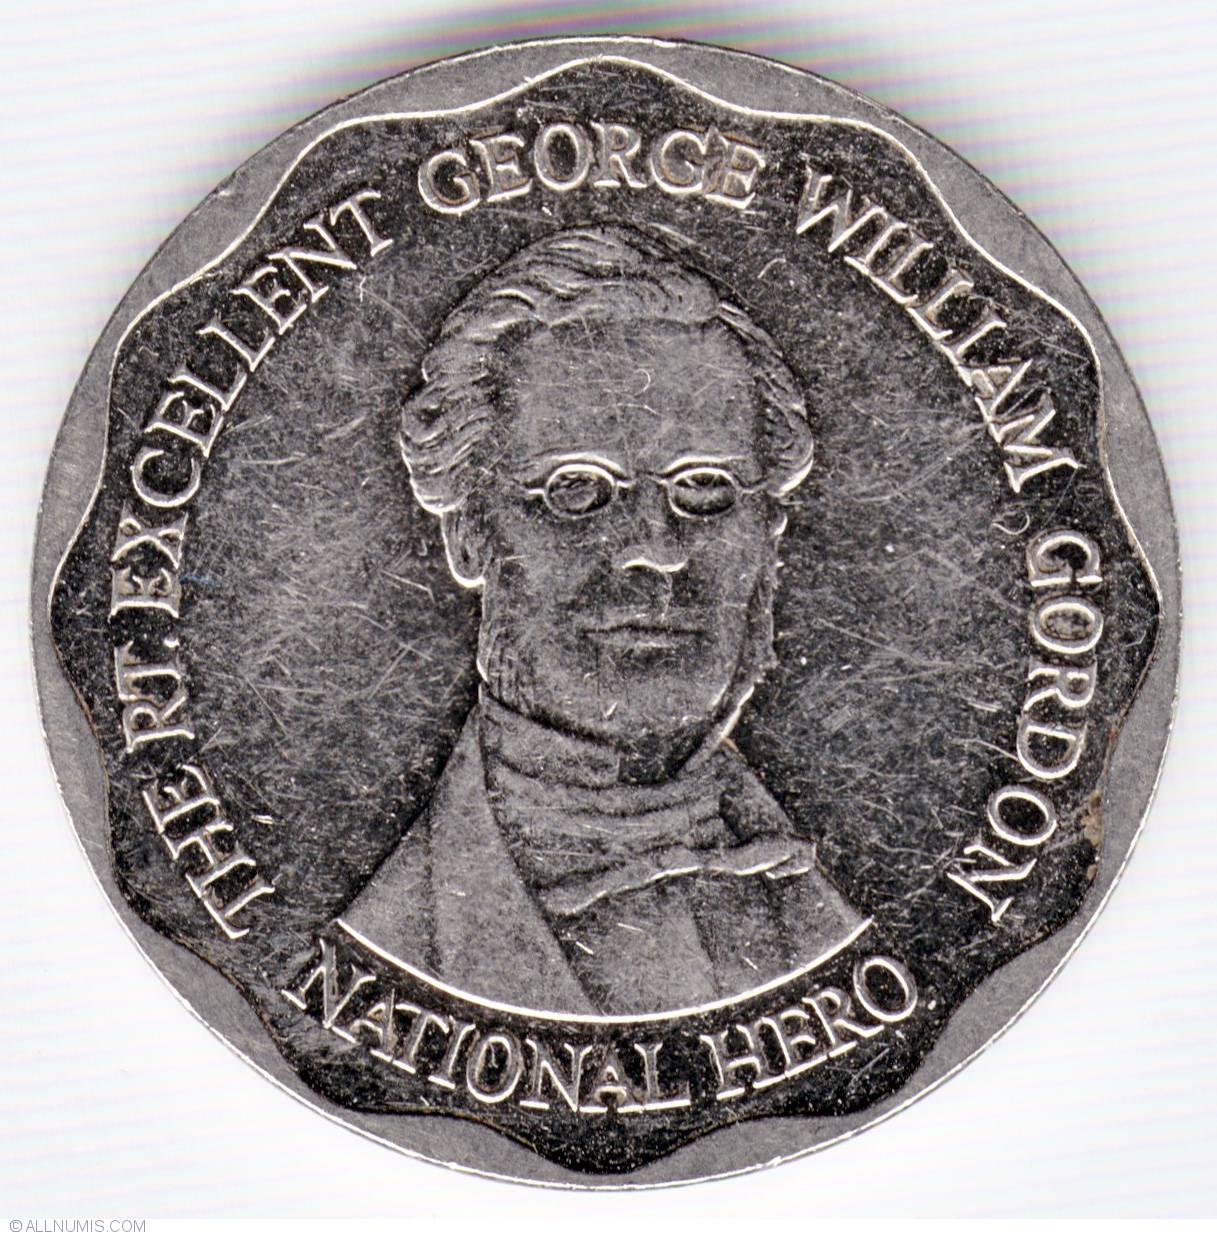 10 Dollars 2008 Commonwealth 2001 Present Jamaica